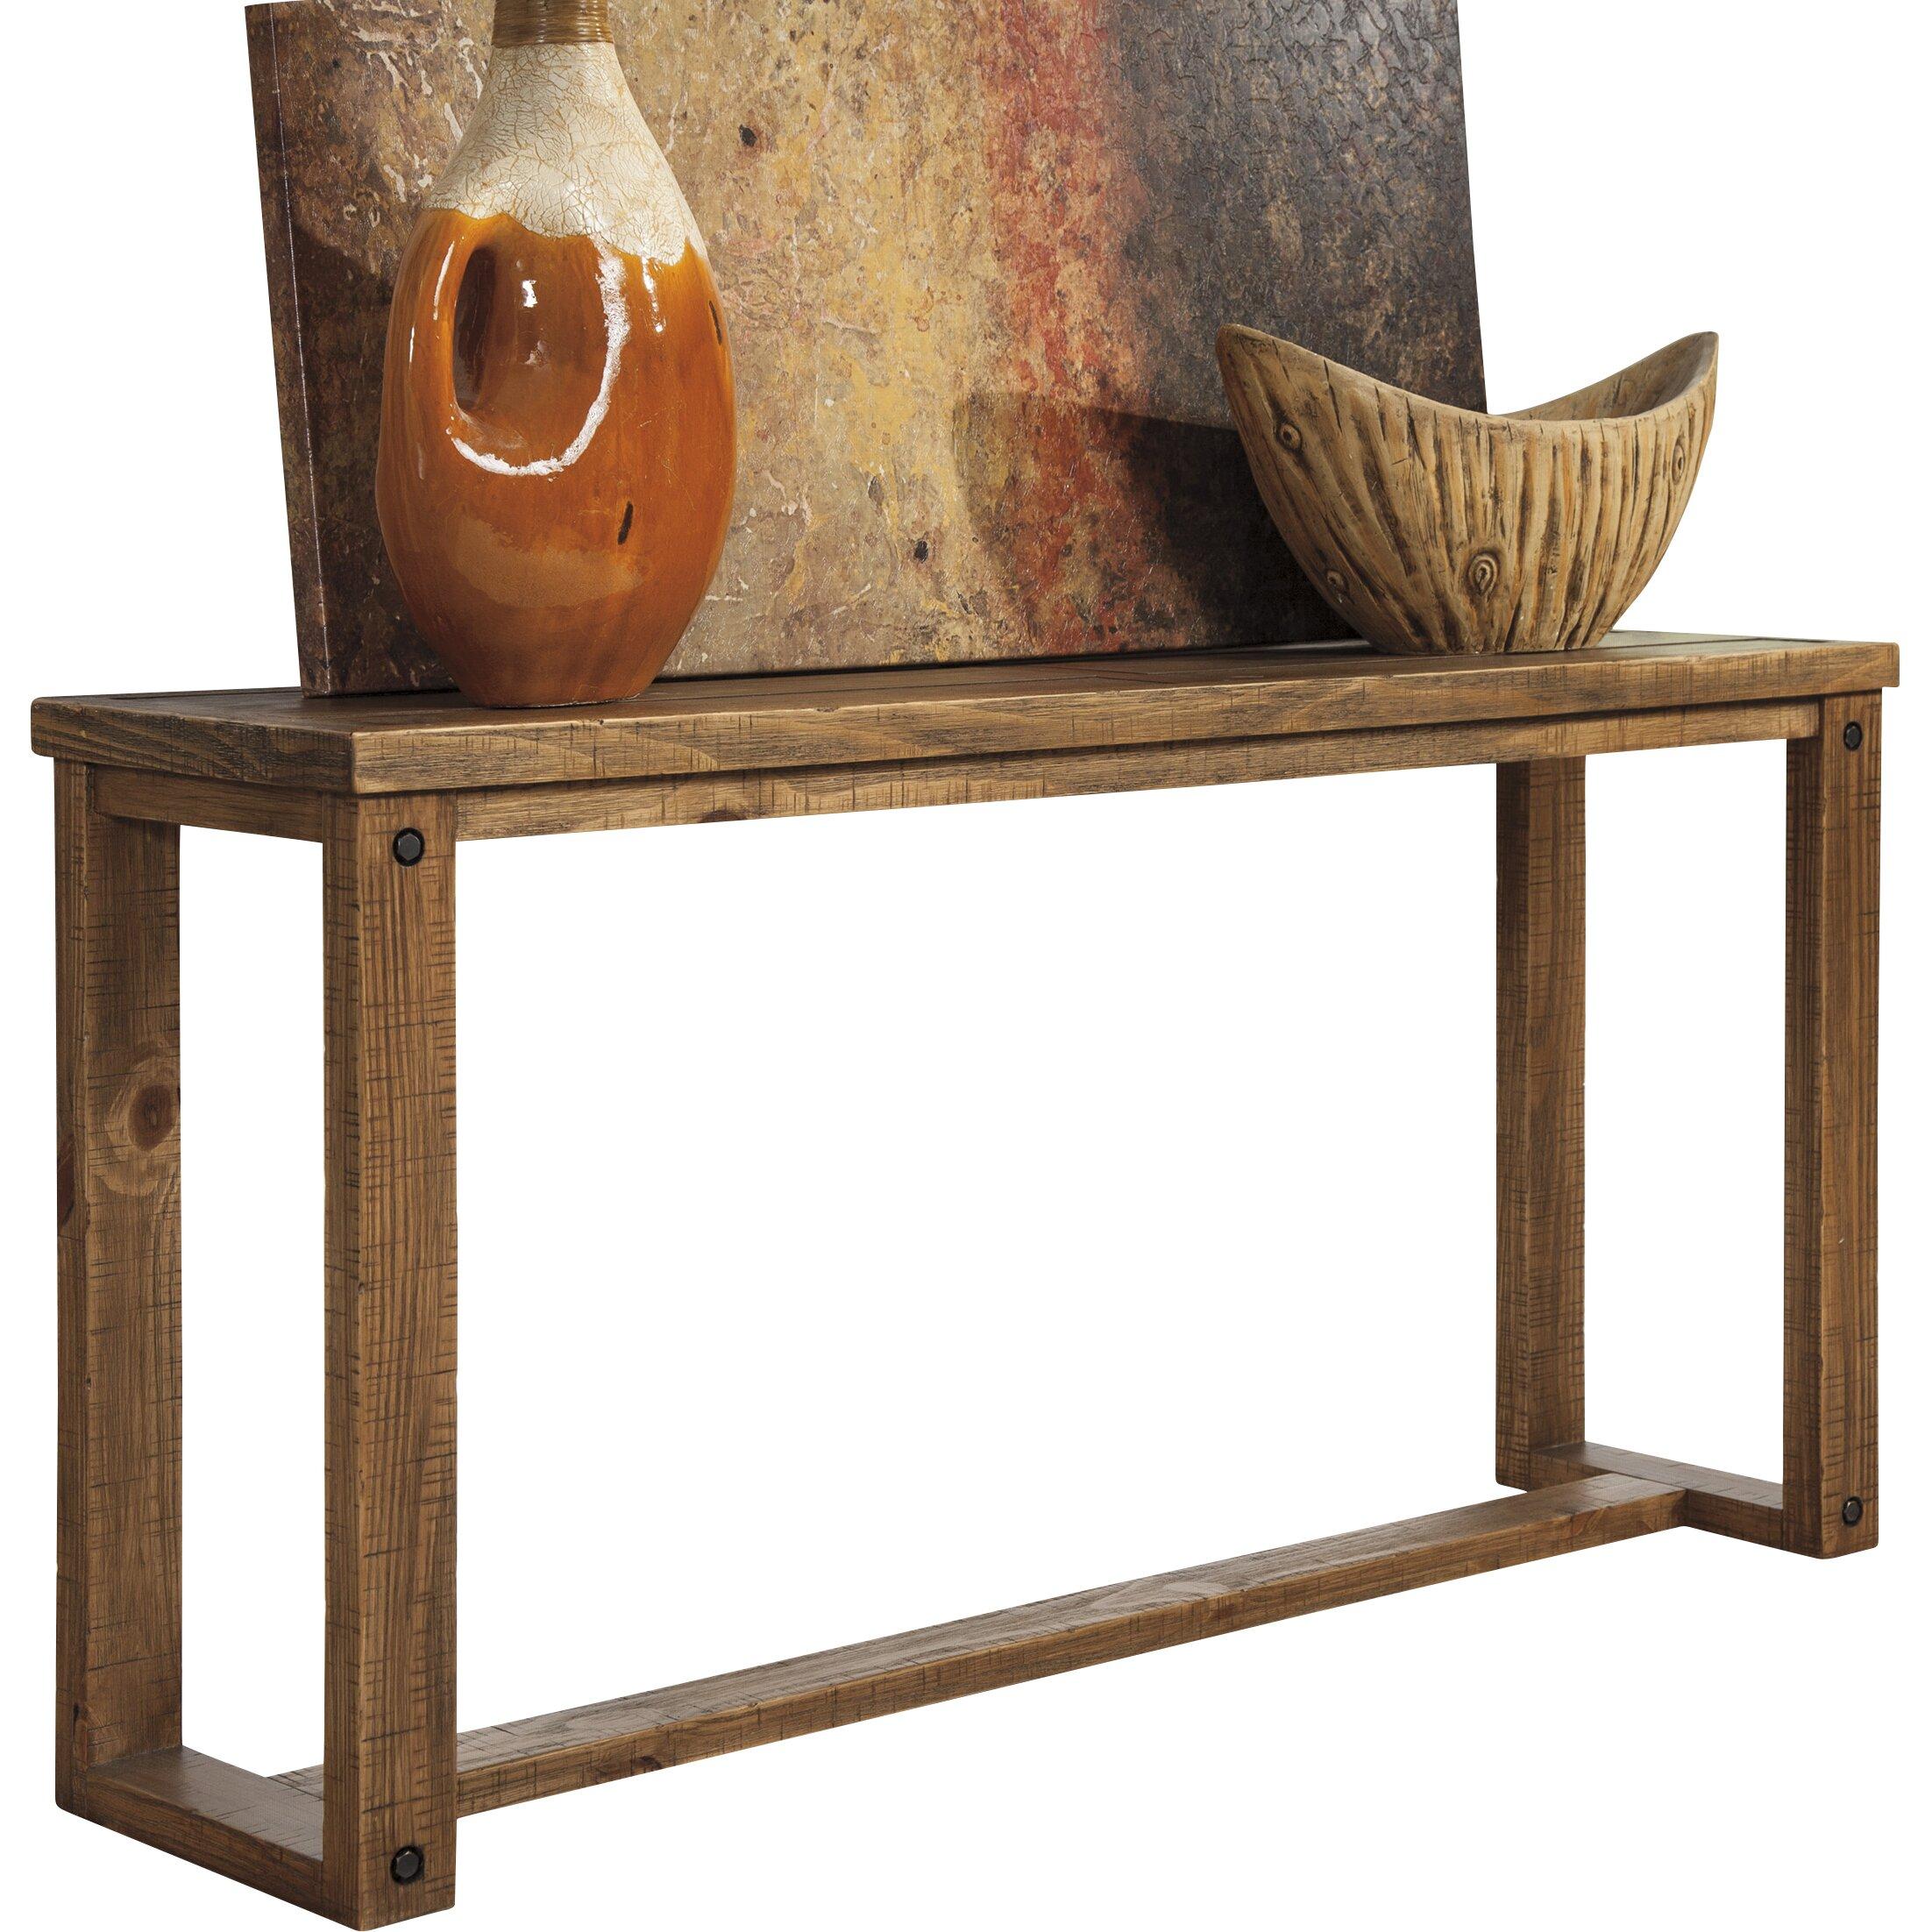 Trent Austin Design Laguna Coffee Table Reviews: Trent Austin Design Carrick Console Table & Reviews